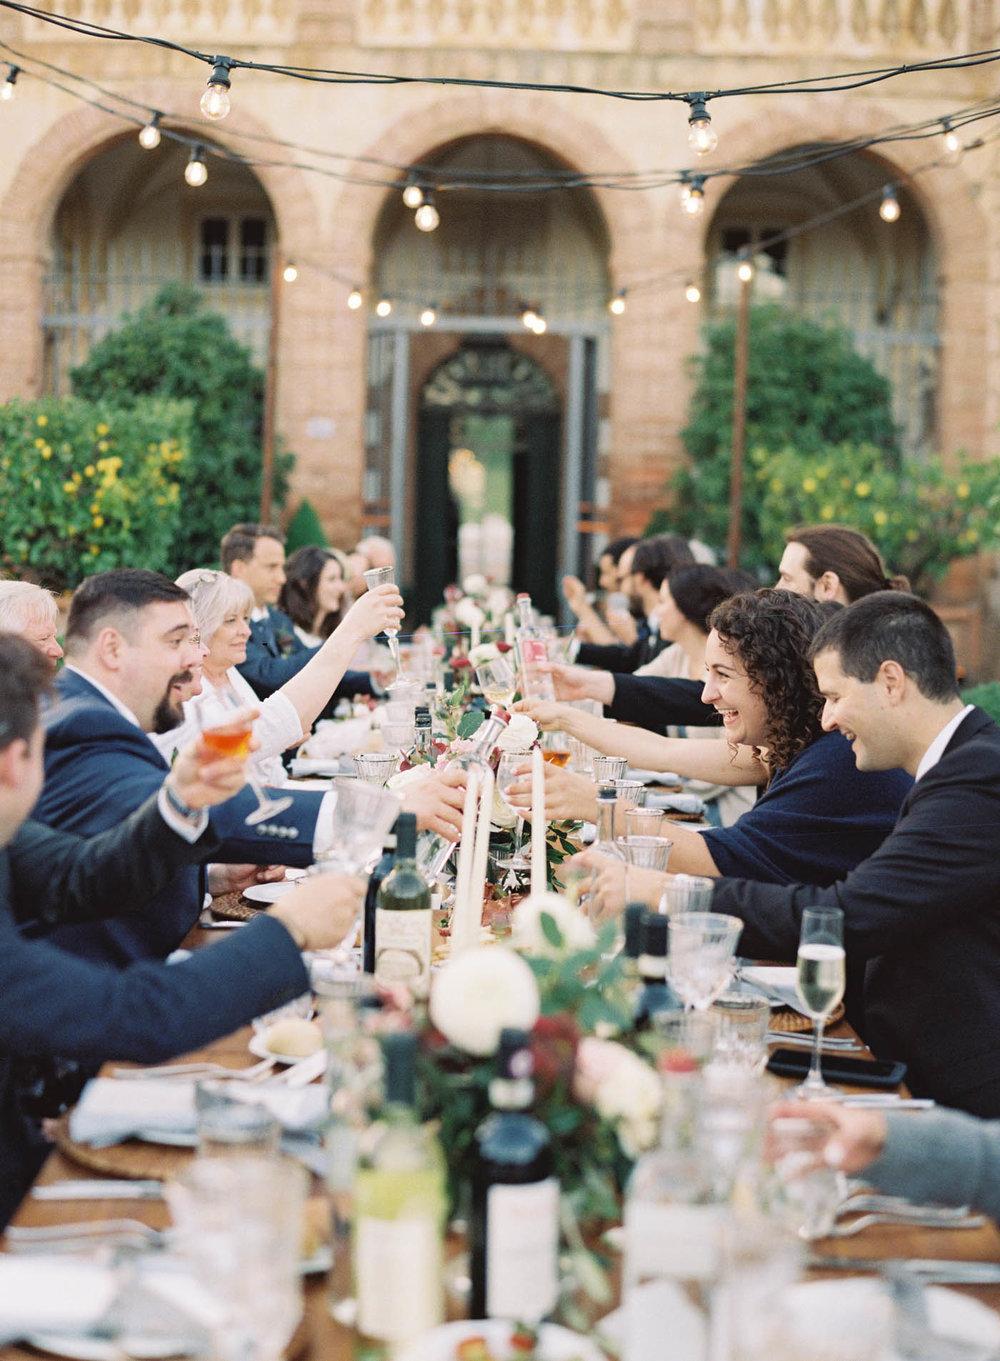 Villa_Cetinale_Wedding-55-Jen_Huang-ElanJacob-337-Jen_Huang-007328-R1-011.jpg